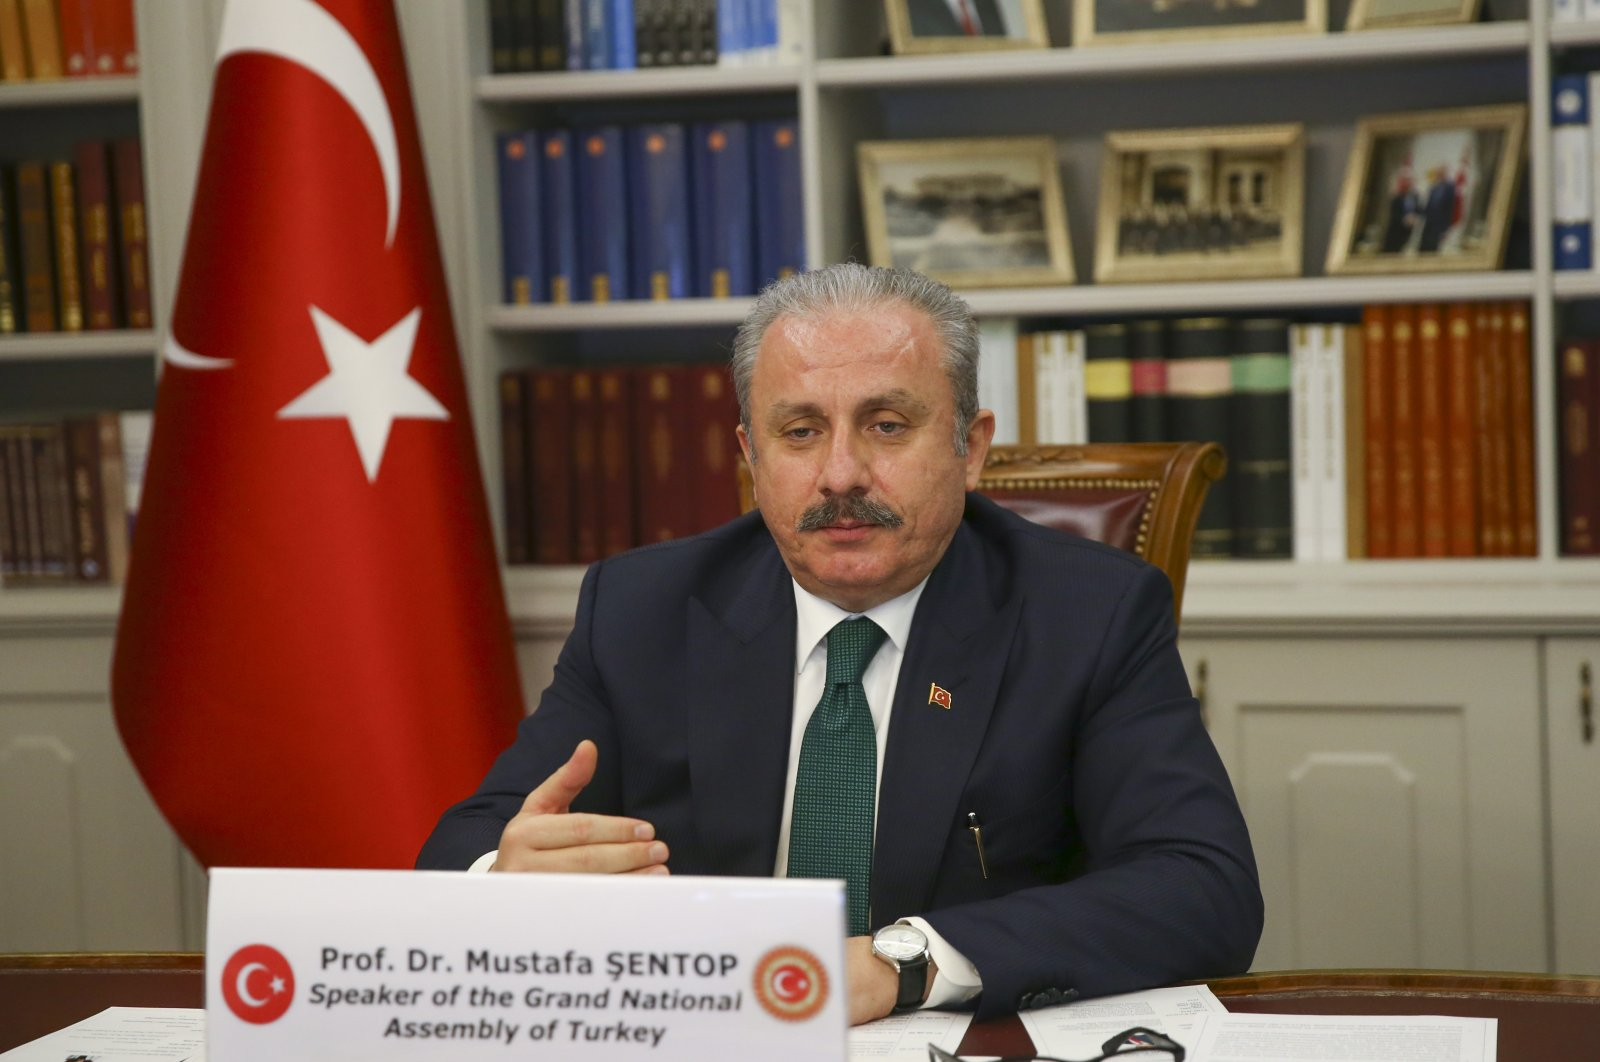 Parliament Head Mustafa Şentop speaks at a videoconference with MIKTA countries in Ankara, Dec. 17, 2020 (AA Photo)